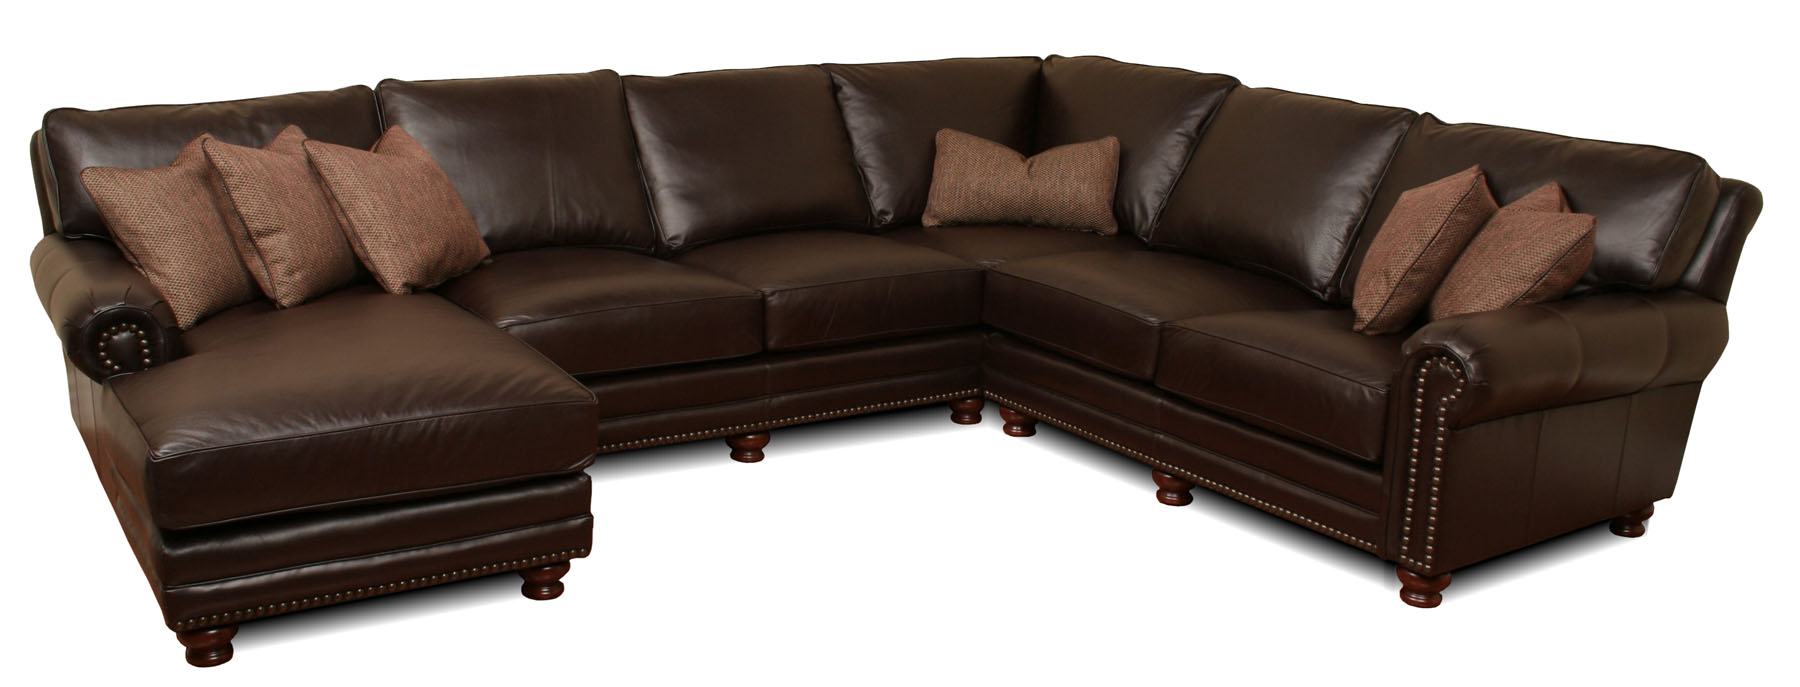 Pleasant Room Planner Sectional Ibusinesslaw Wood Chair Design Ideas Ibusinesslaworg